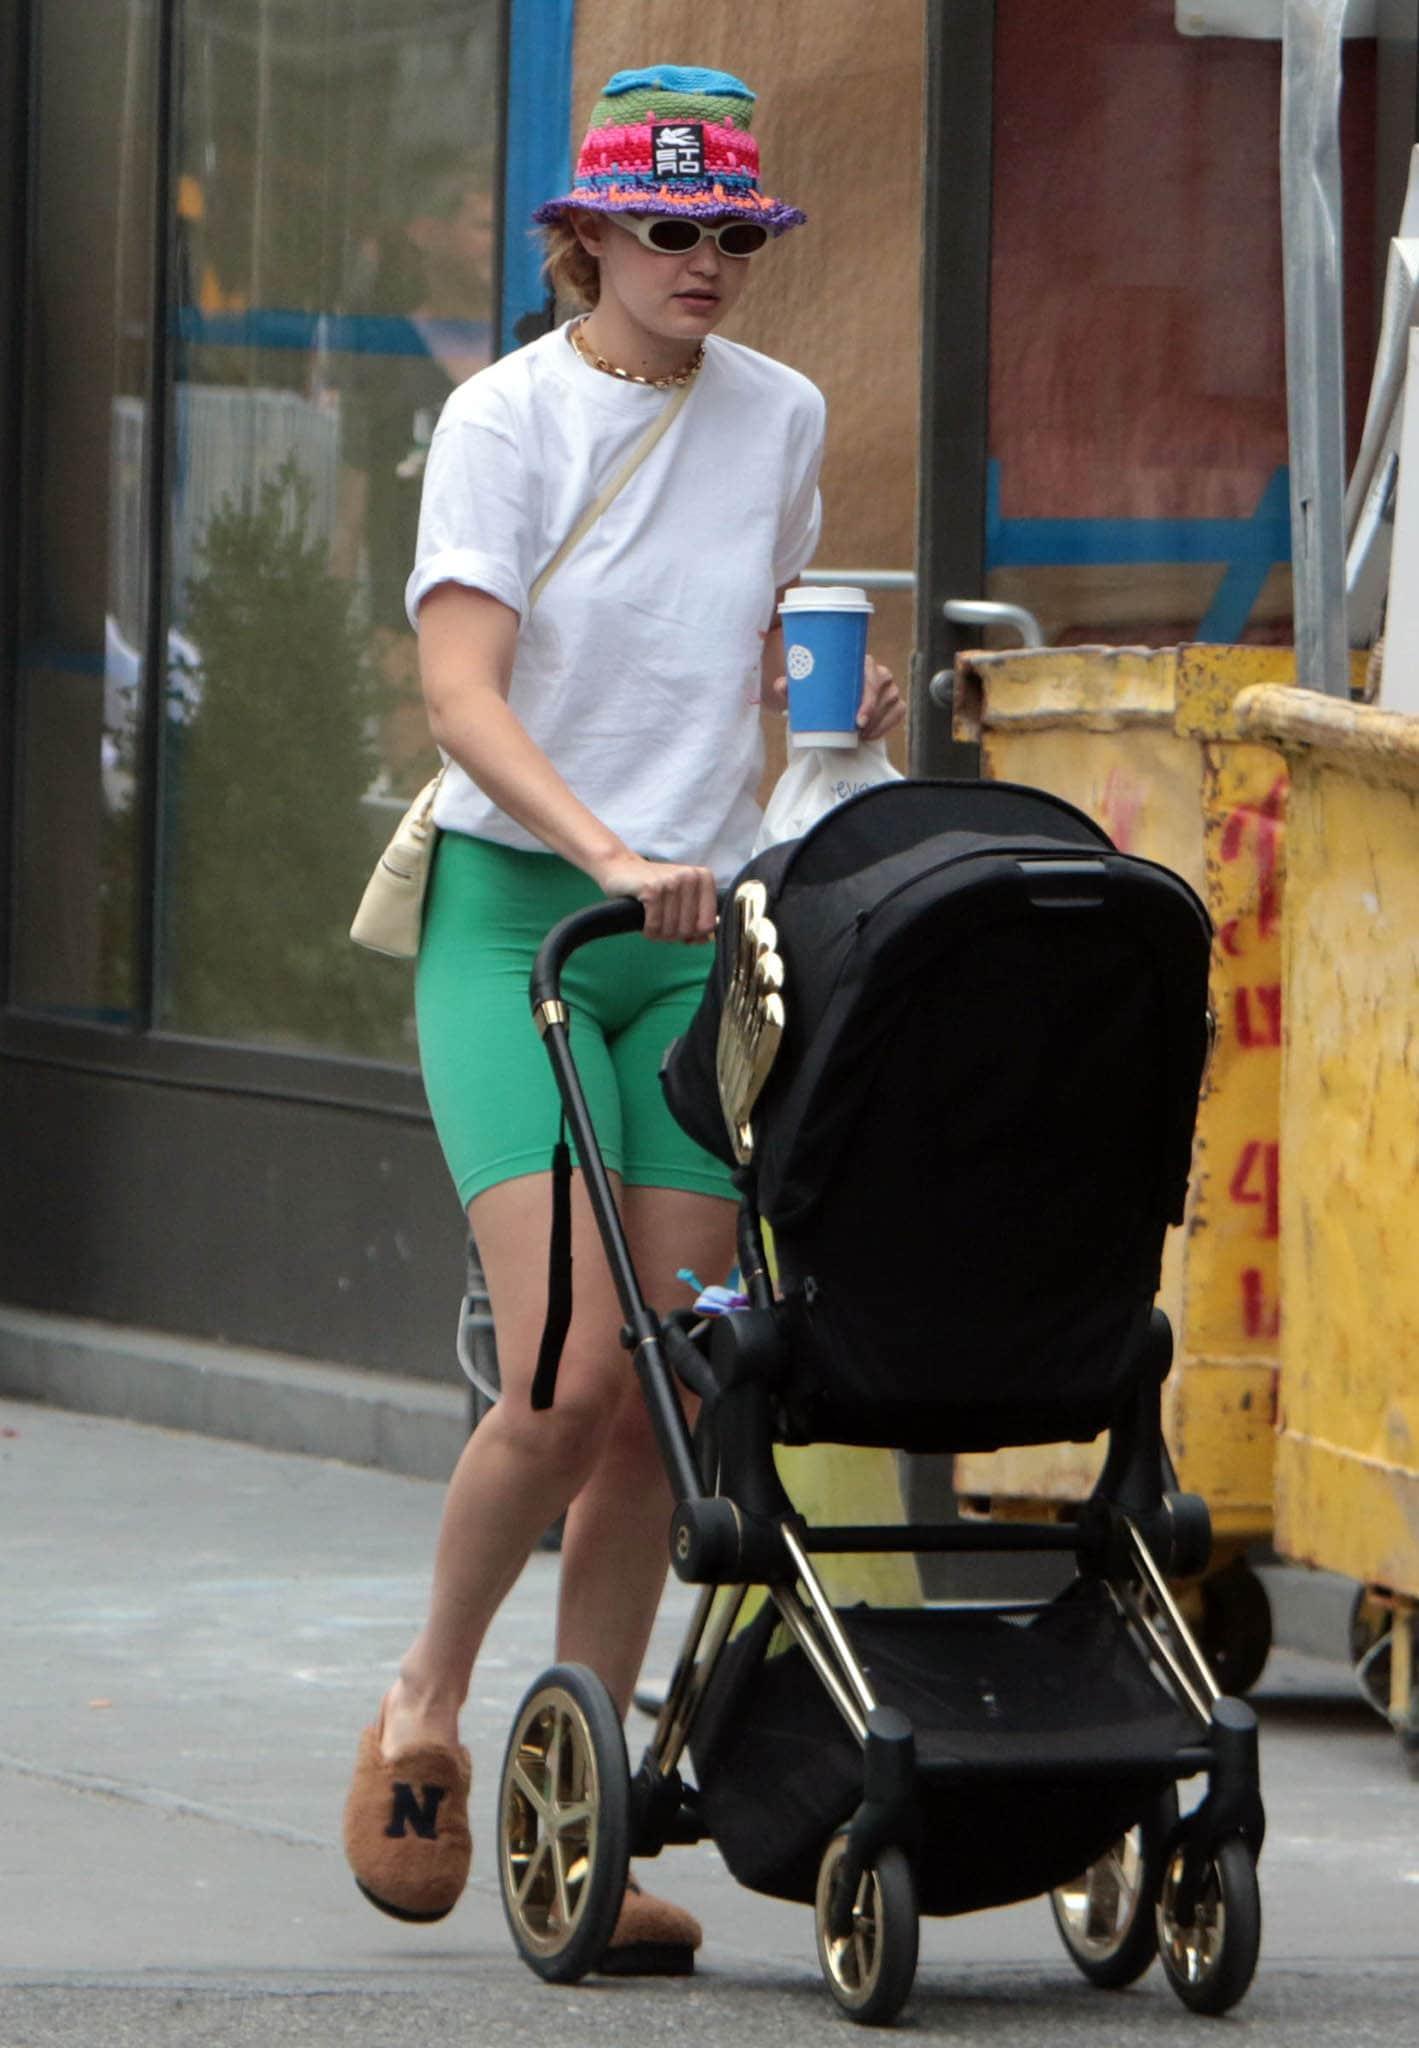 Gigi Hadid strolls around New York City with her daughter Khai on July 29, 2021